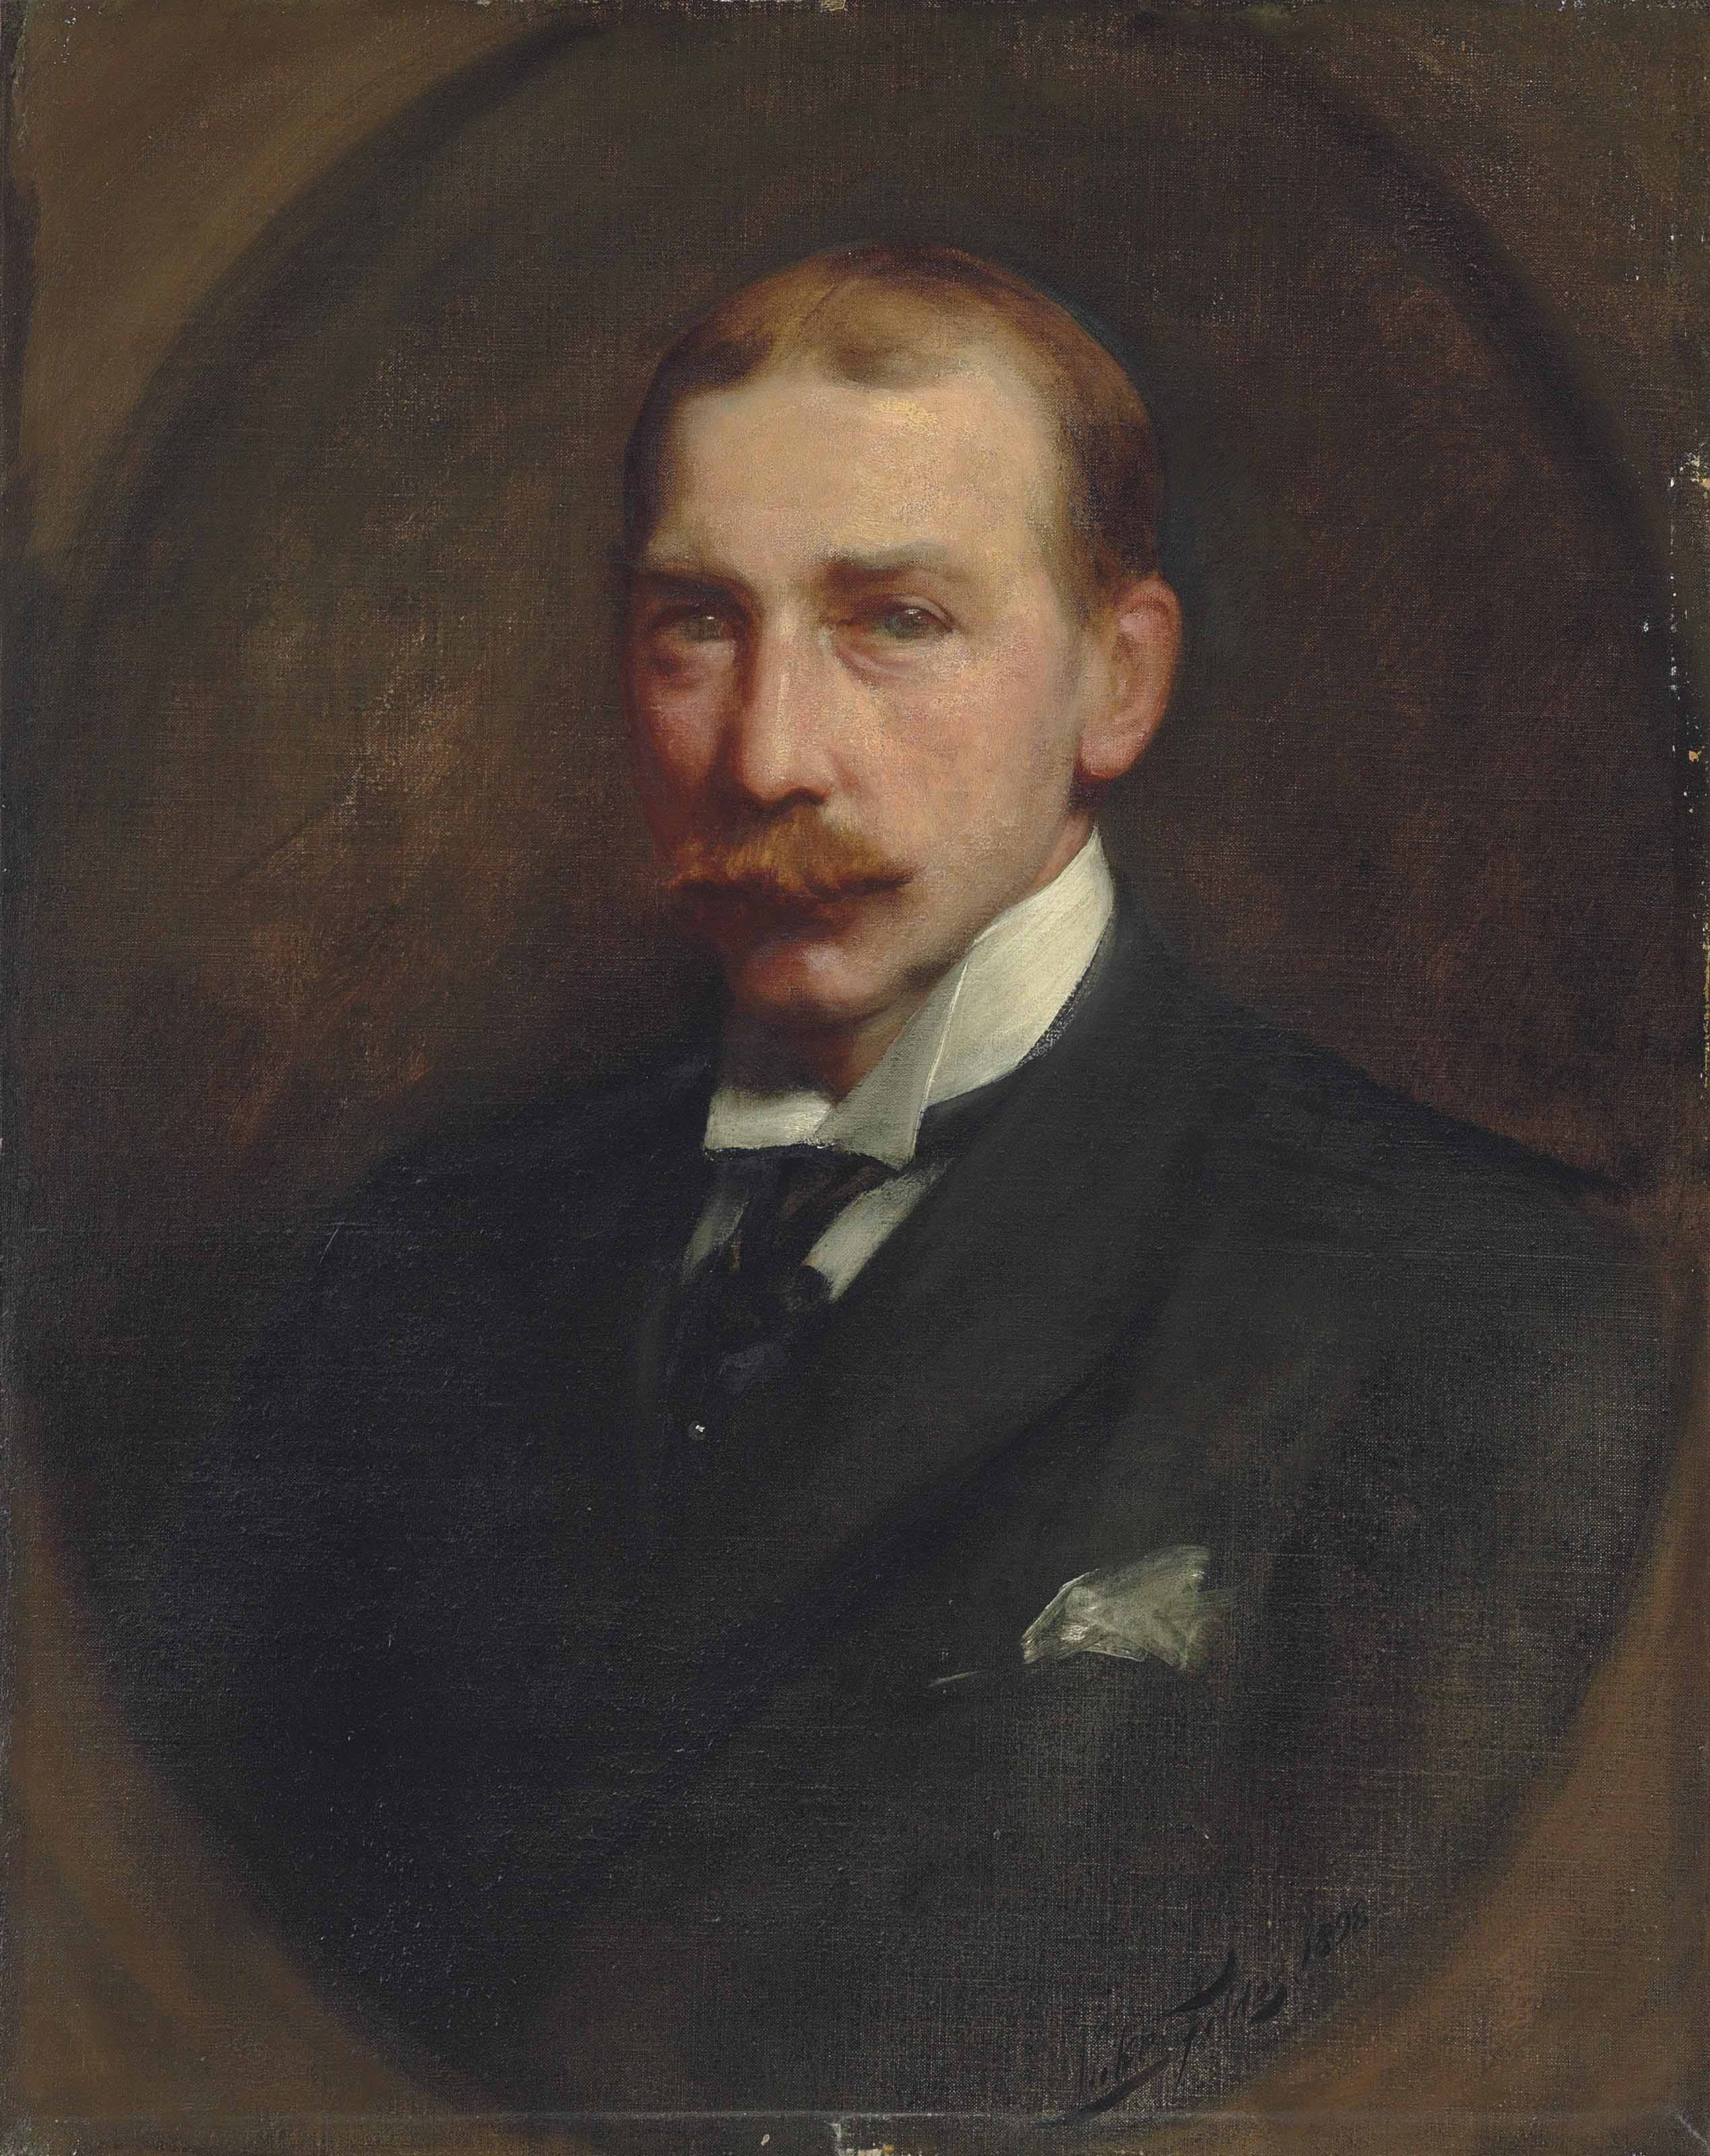 Portrait of (William) Lockett Agnew (1858-1918), half-length